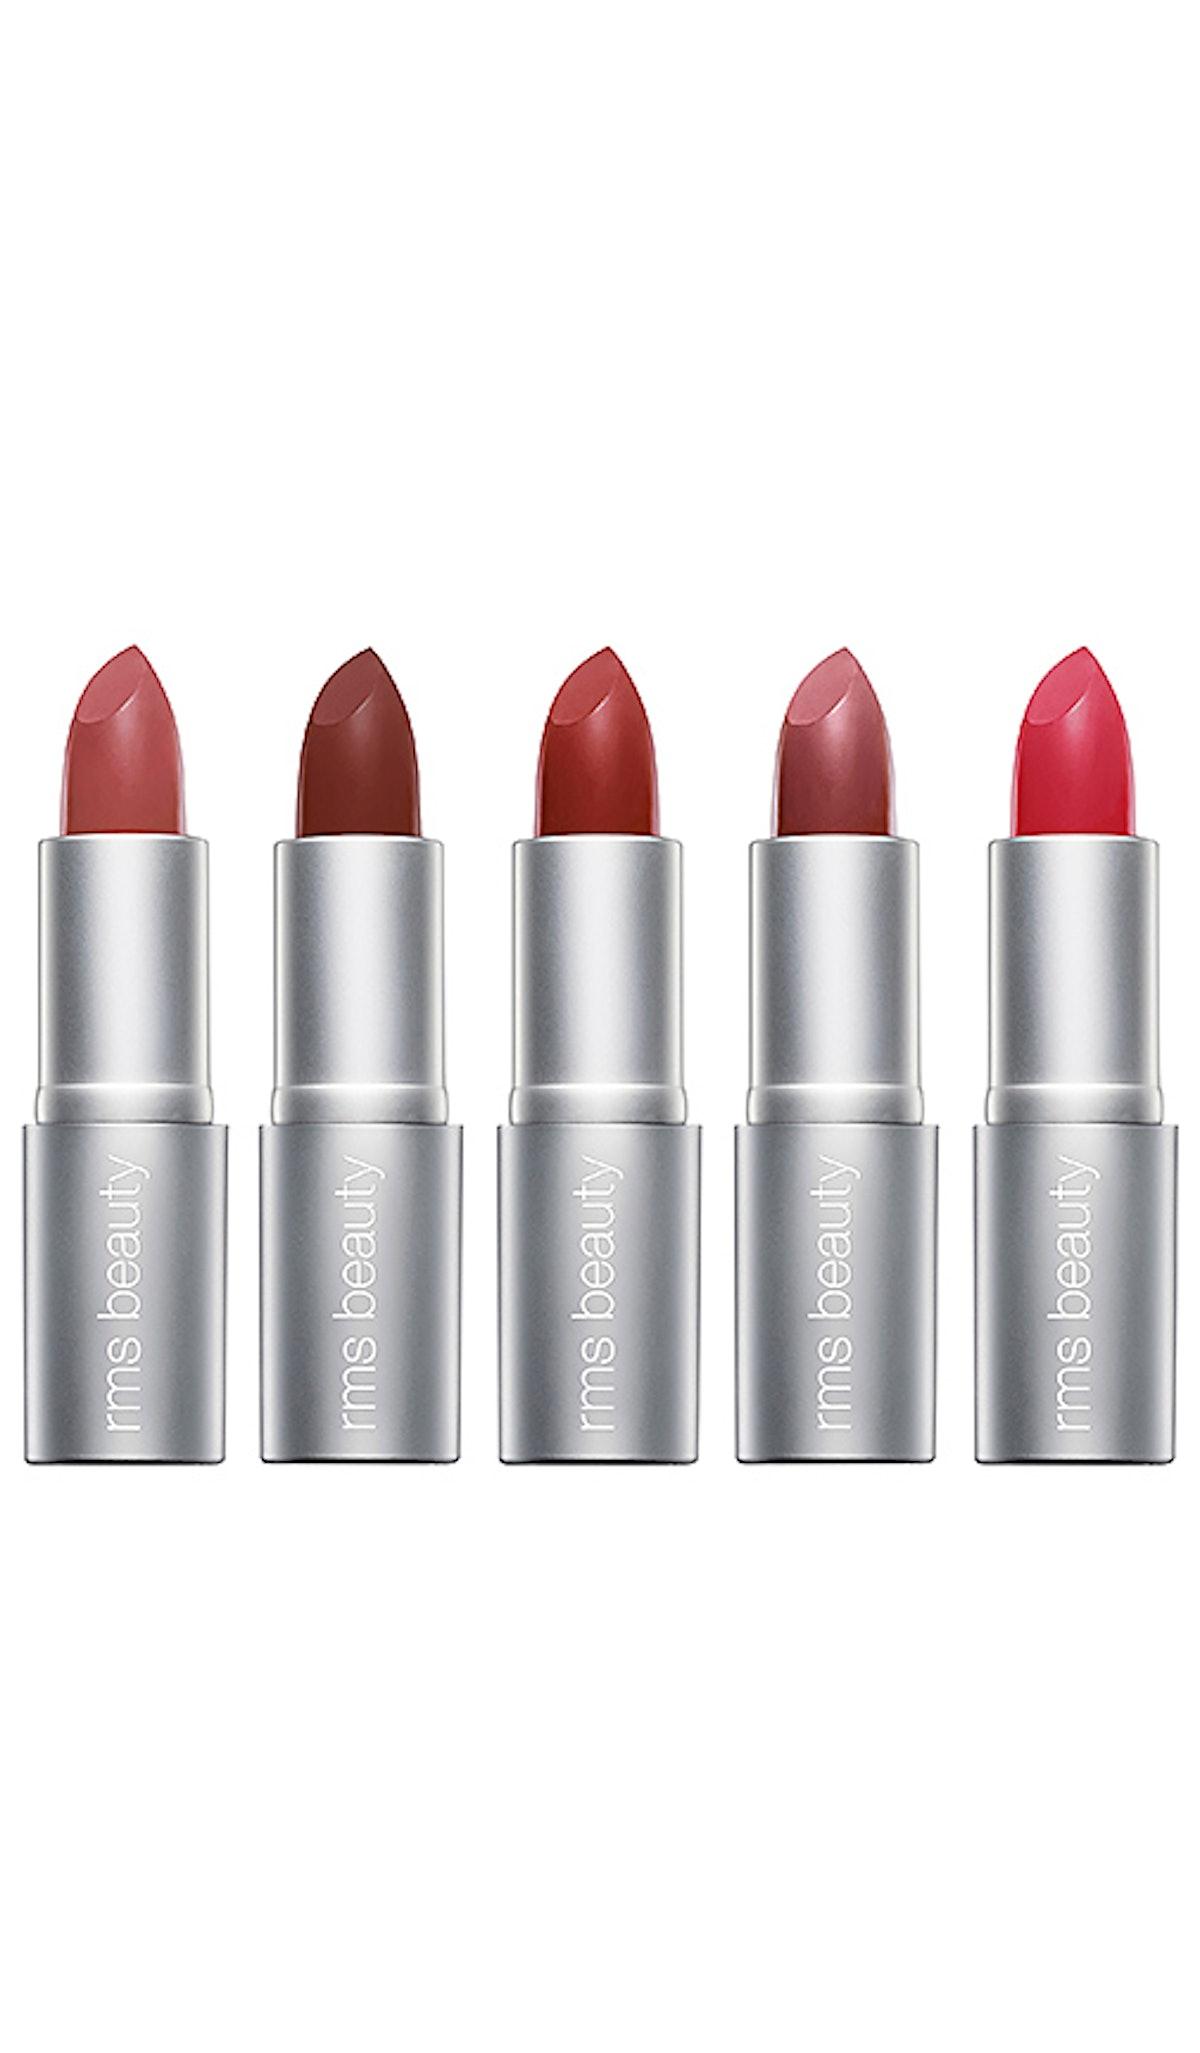 RMS Beauty Wild With Desire Mini Lipstick Set